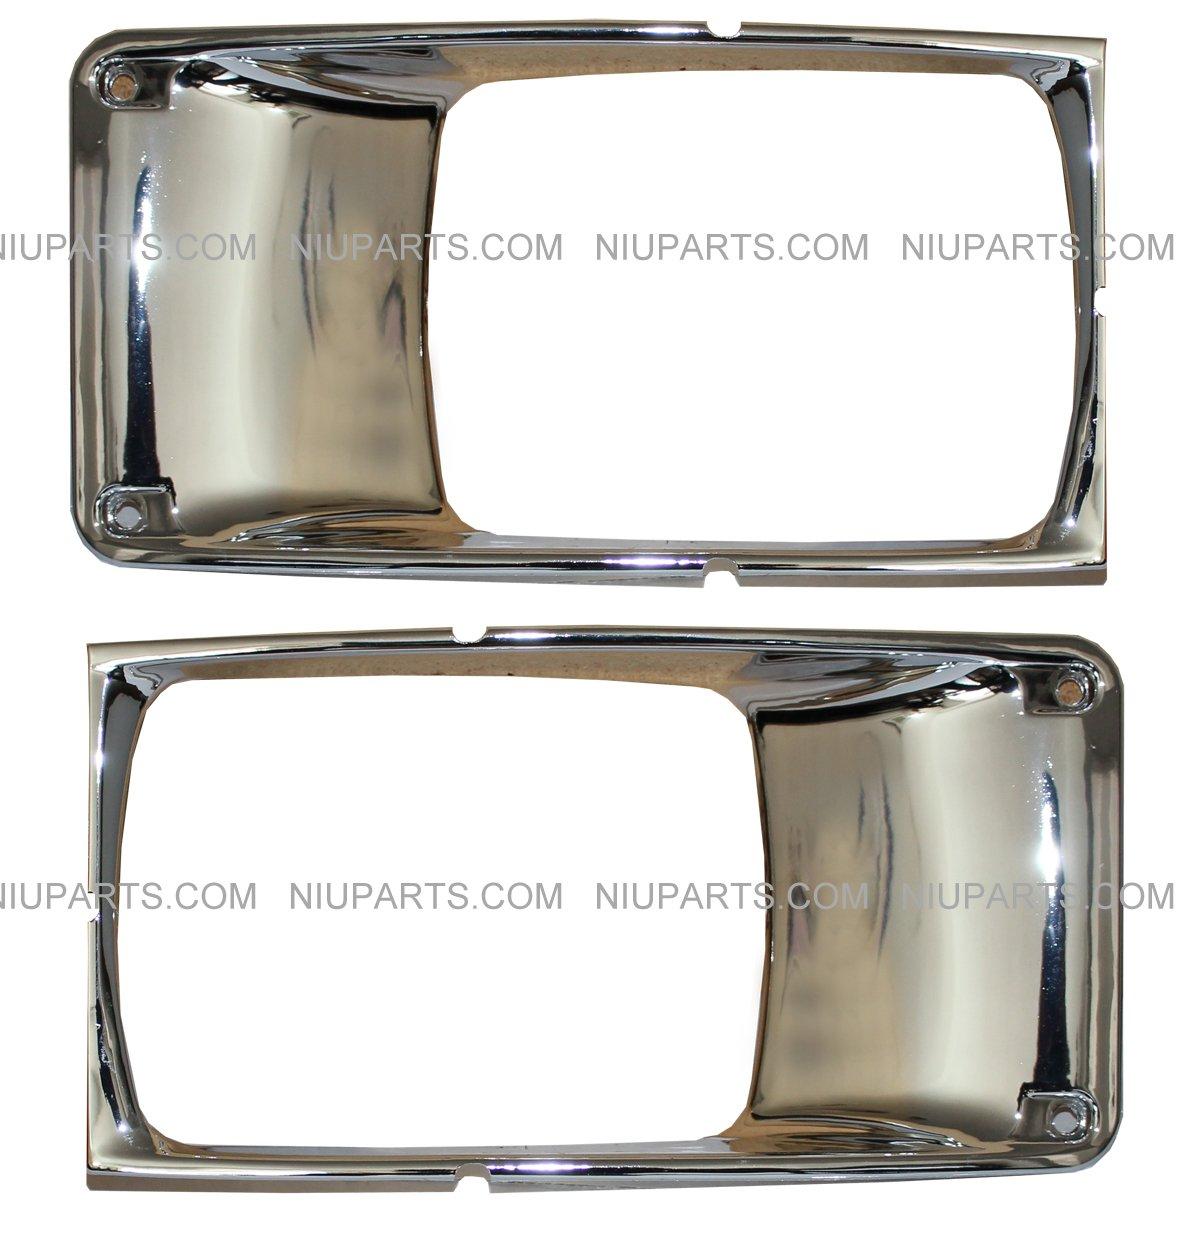 Headlight Bezel 2 Piece (Fit: International Truck 3800 4700 4800 4900) NIUPARTS